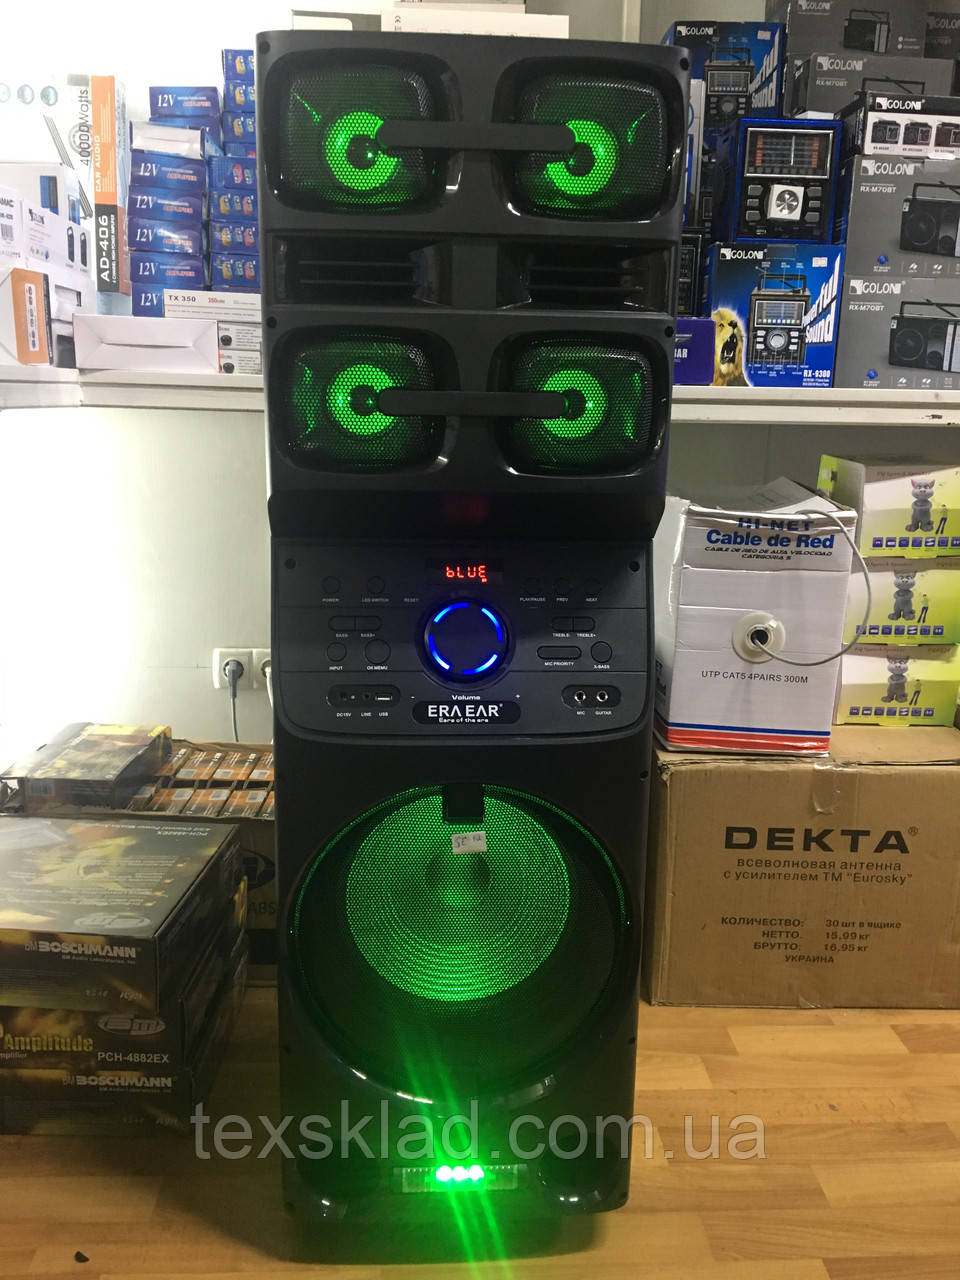 Портативная акустика с микрофонами ERA E-12 /180W (USB/Bluetooth/Пульт ДУ/FM)